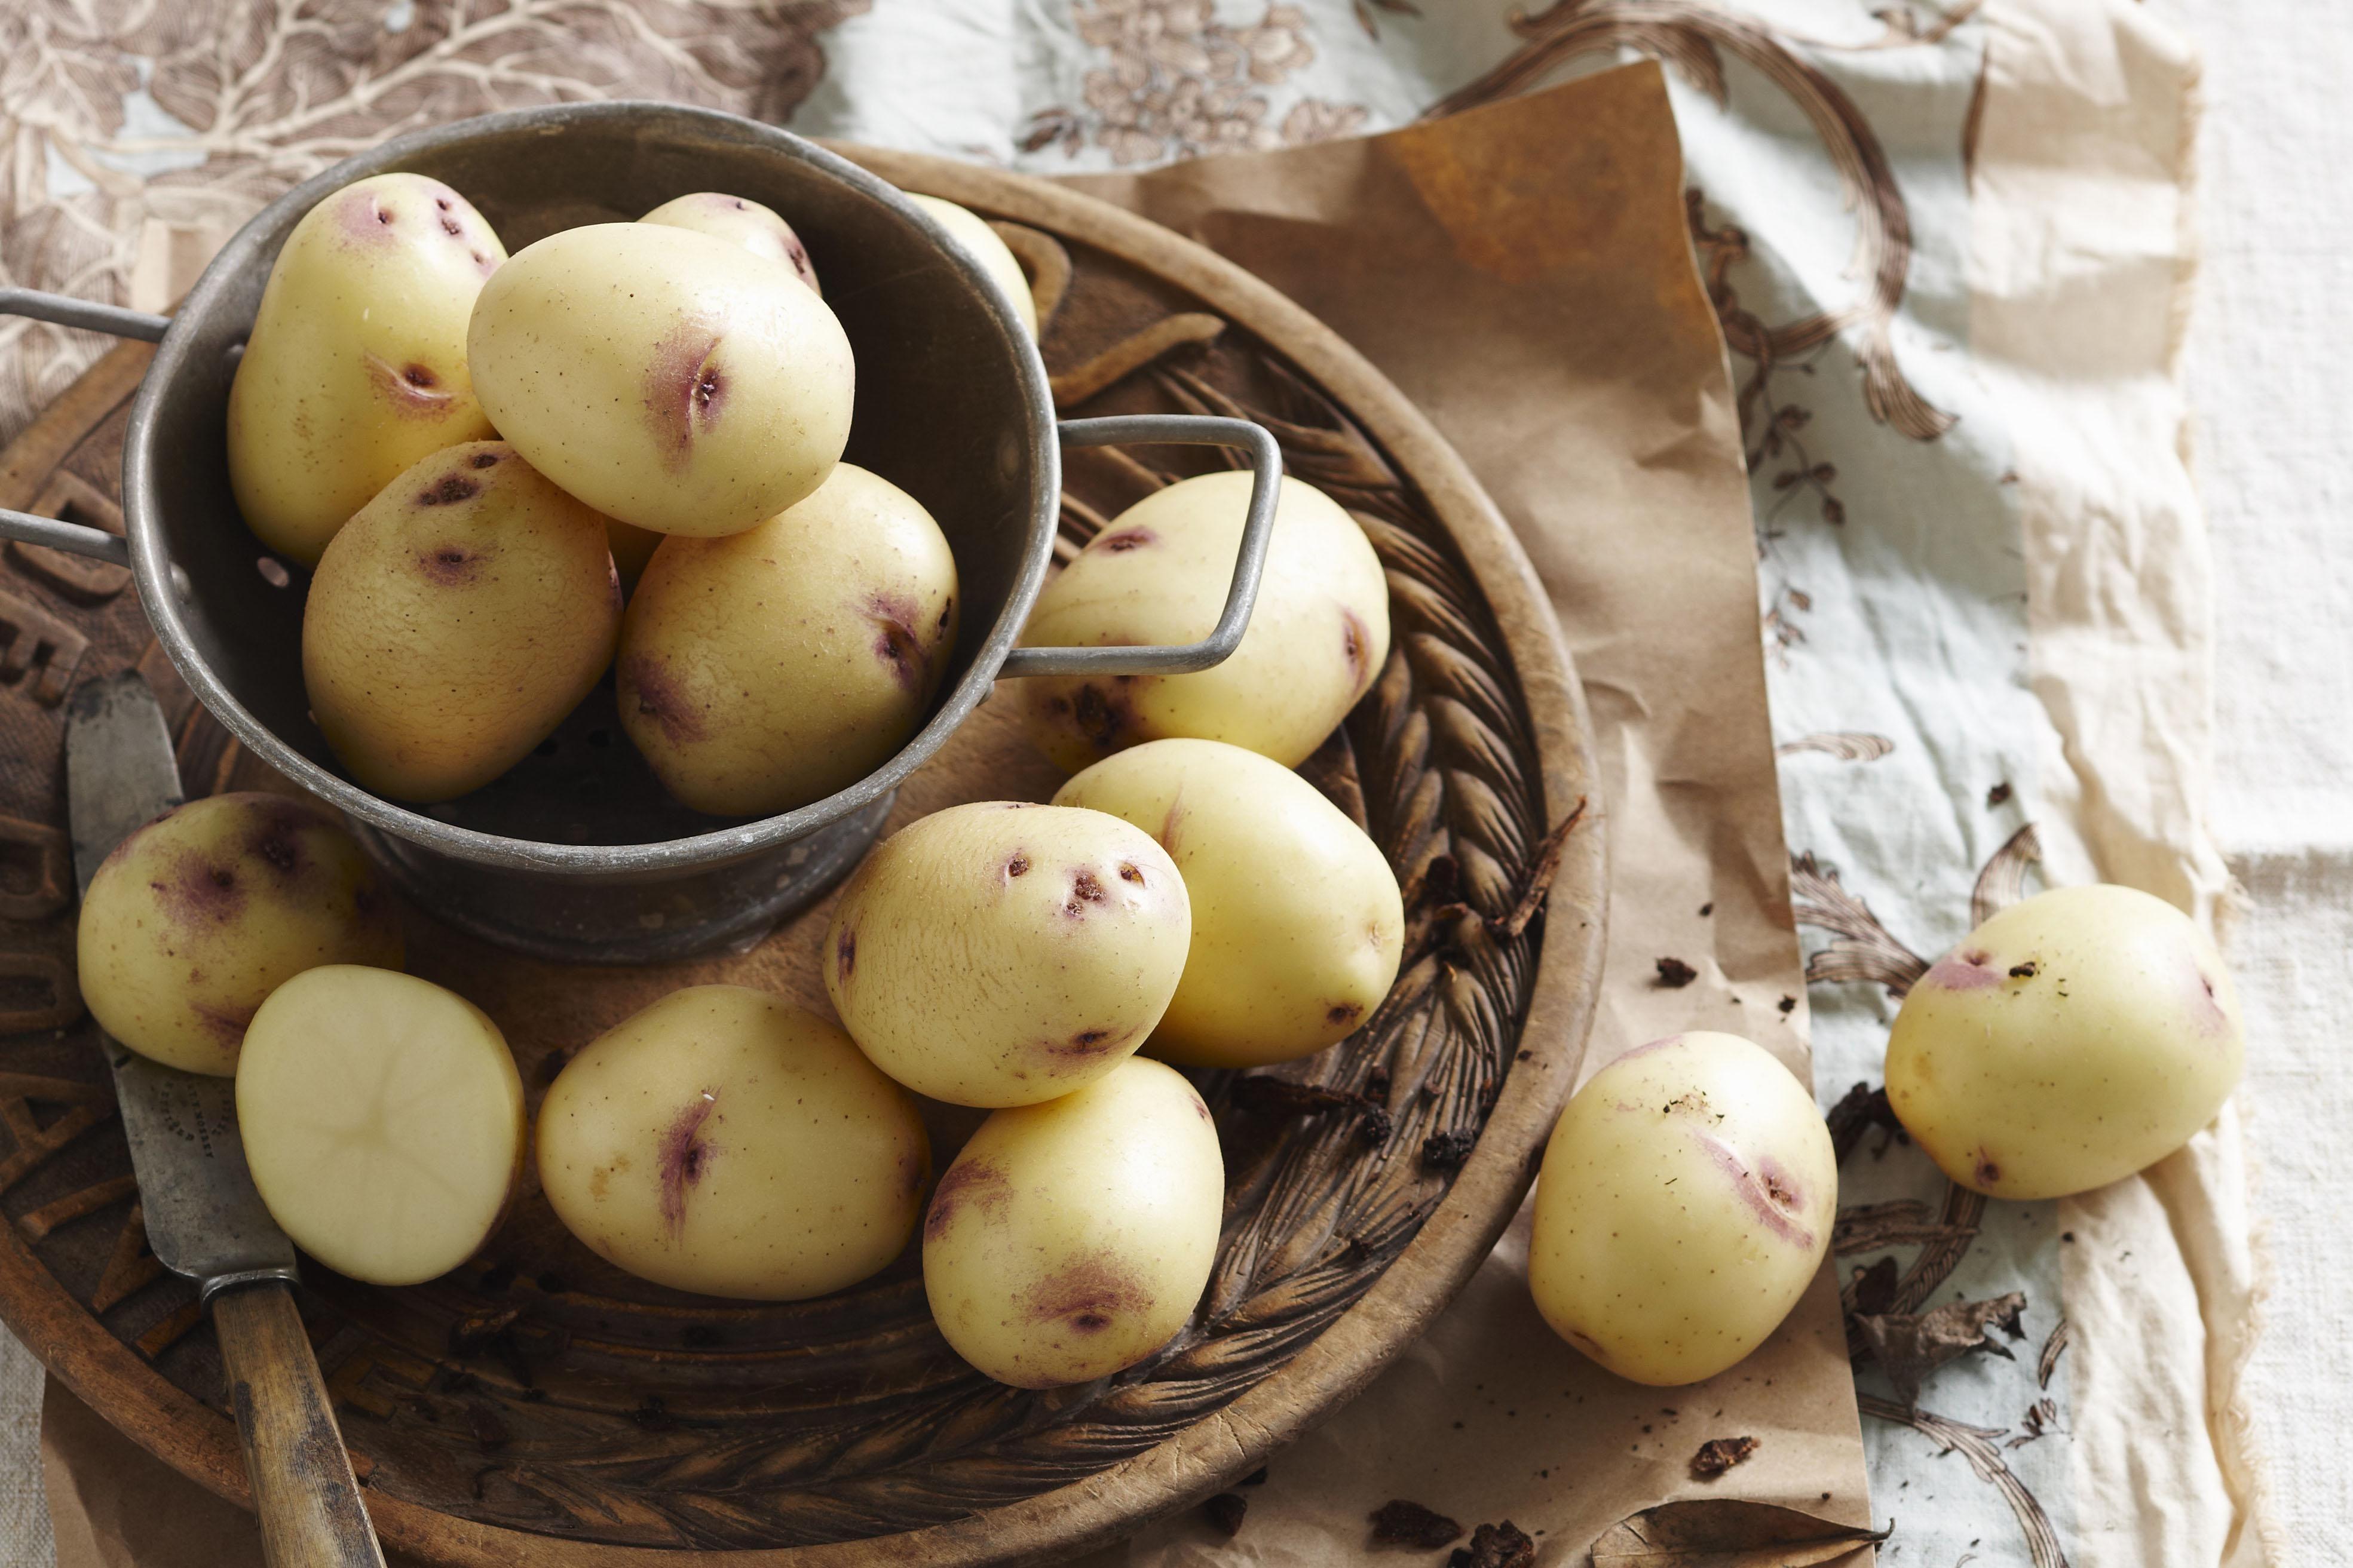 Can Diabetics Eat Bread And Potatoes?